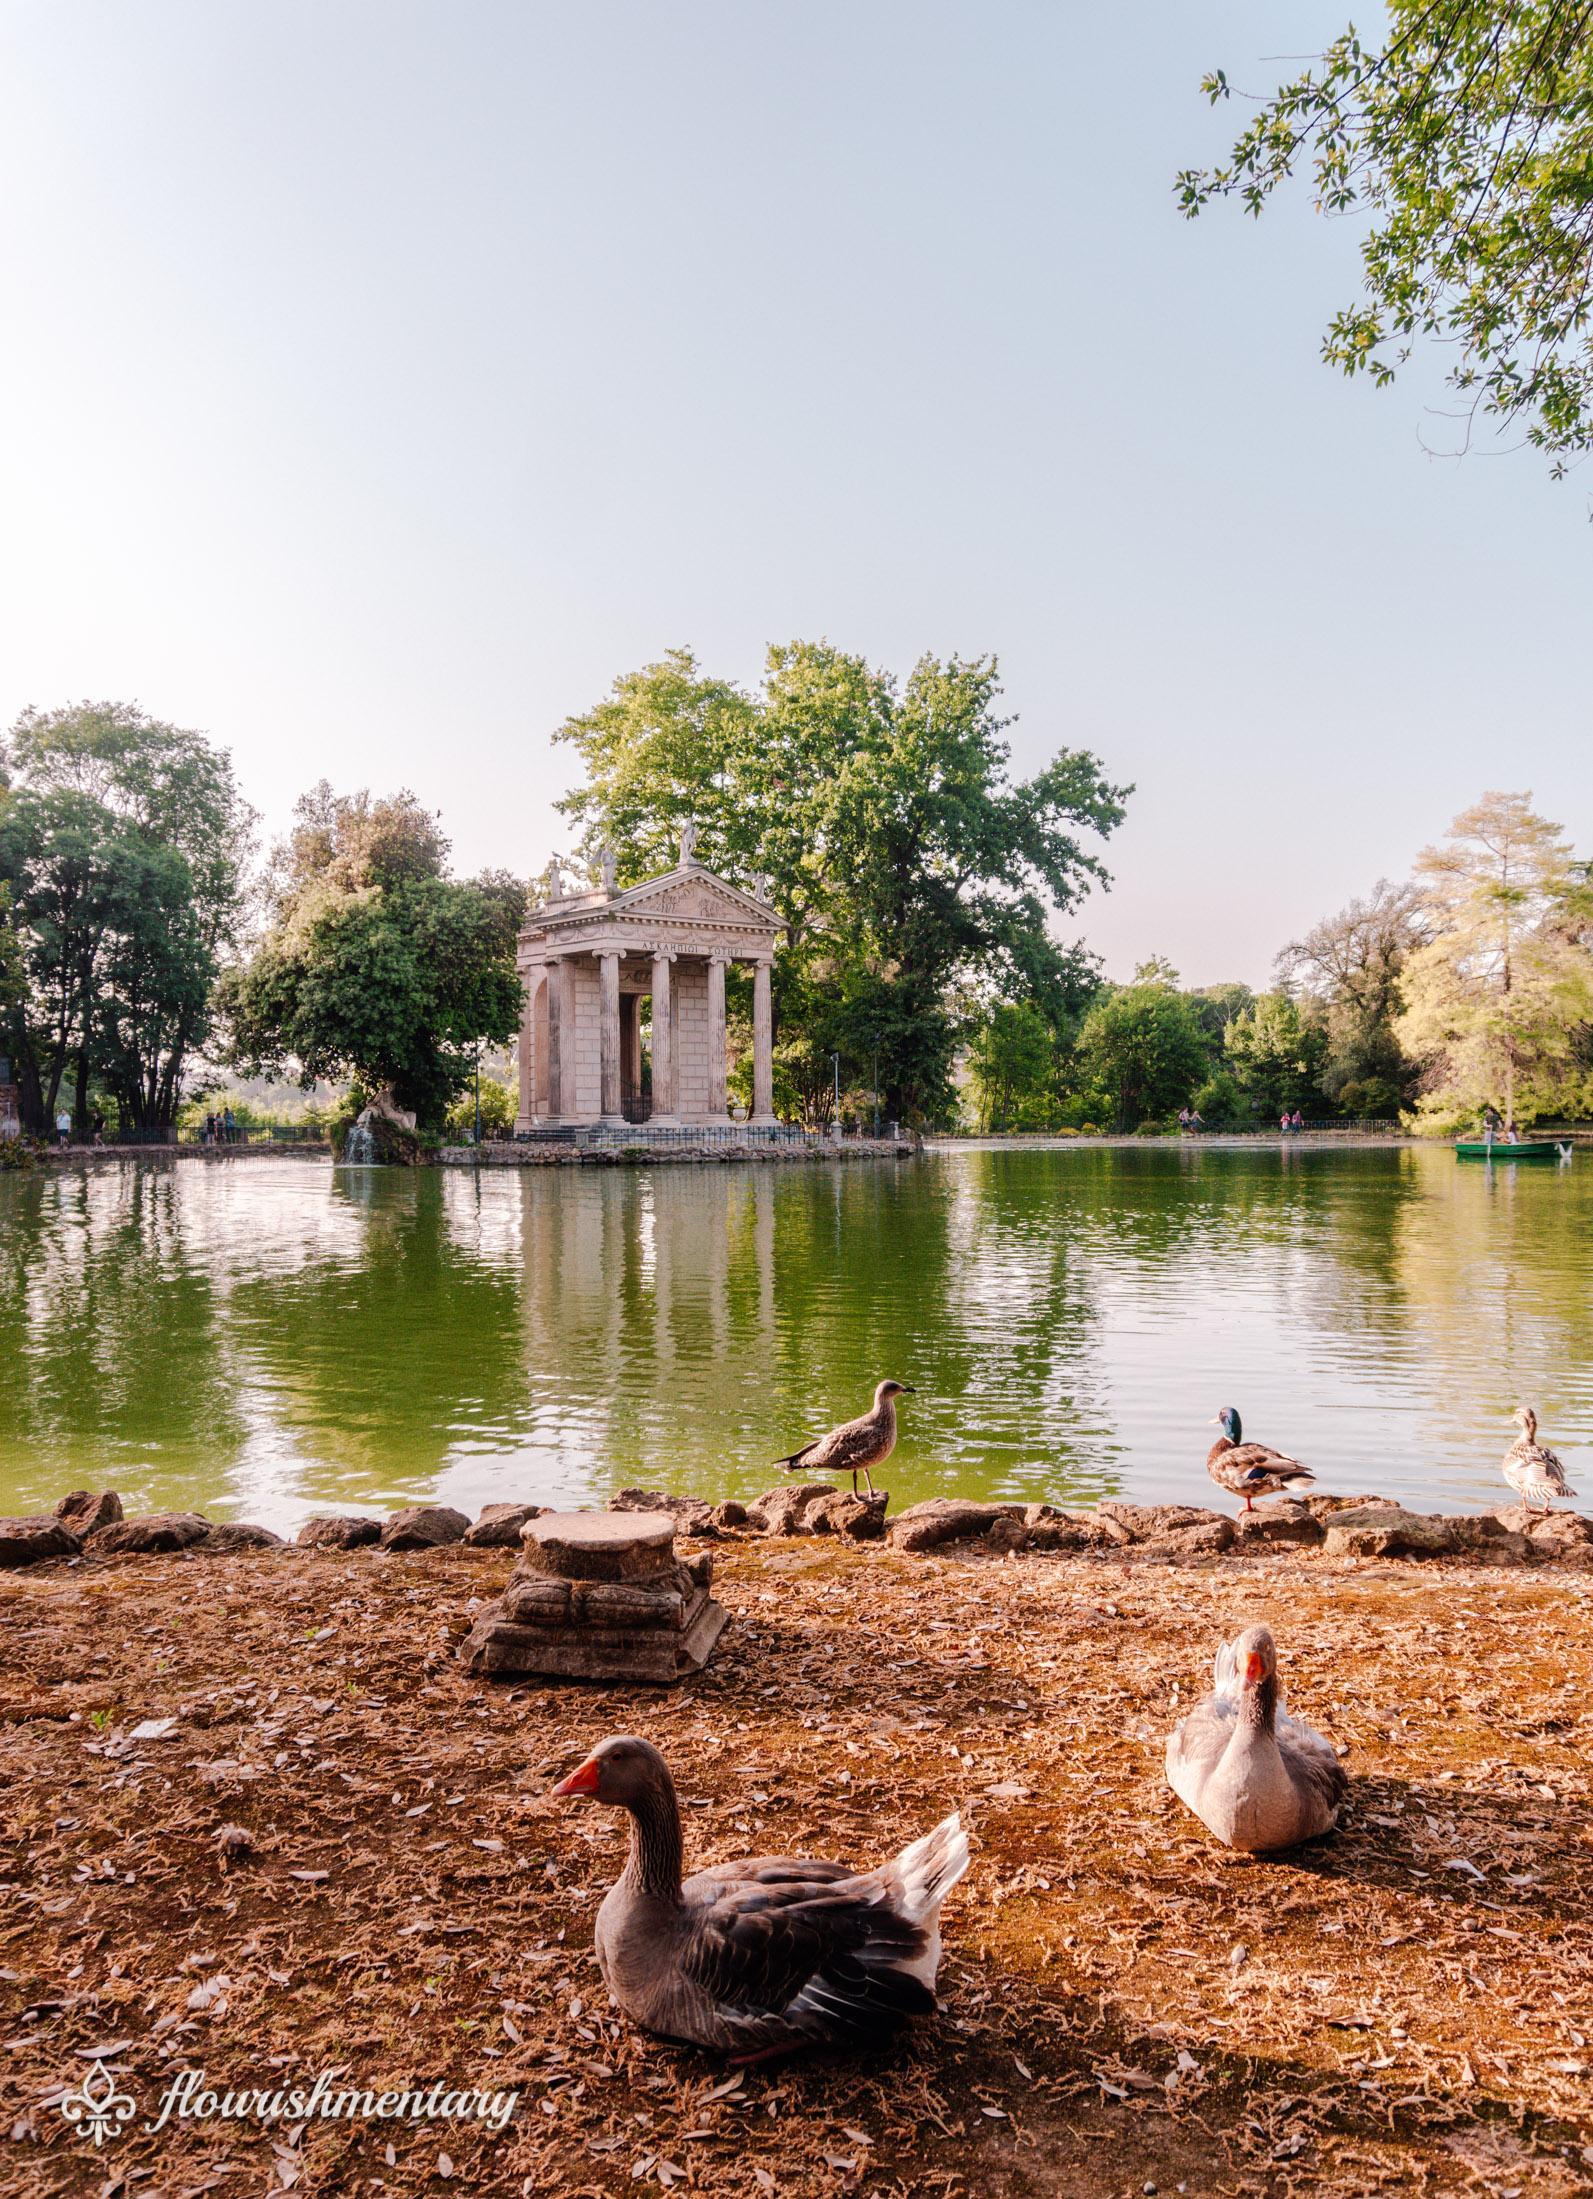 ducks Temple of Aesculapius in Villa Borghese Gardens